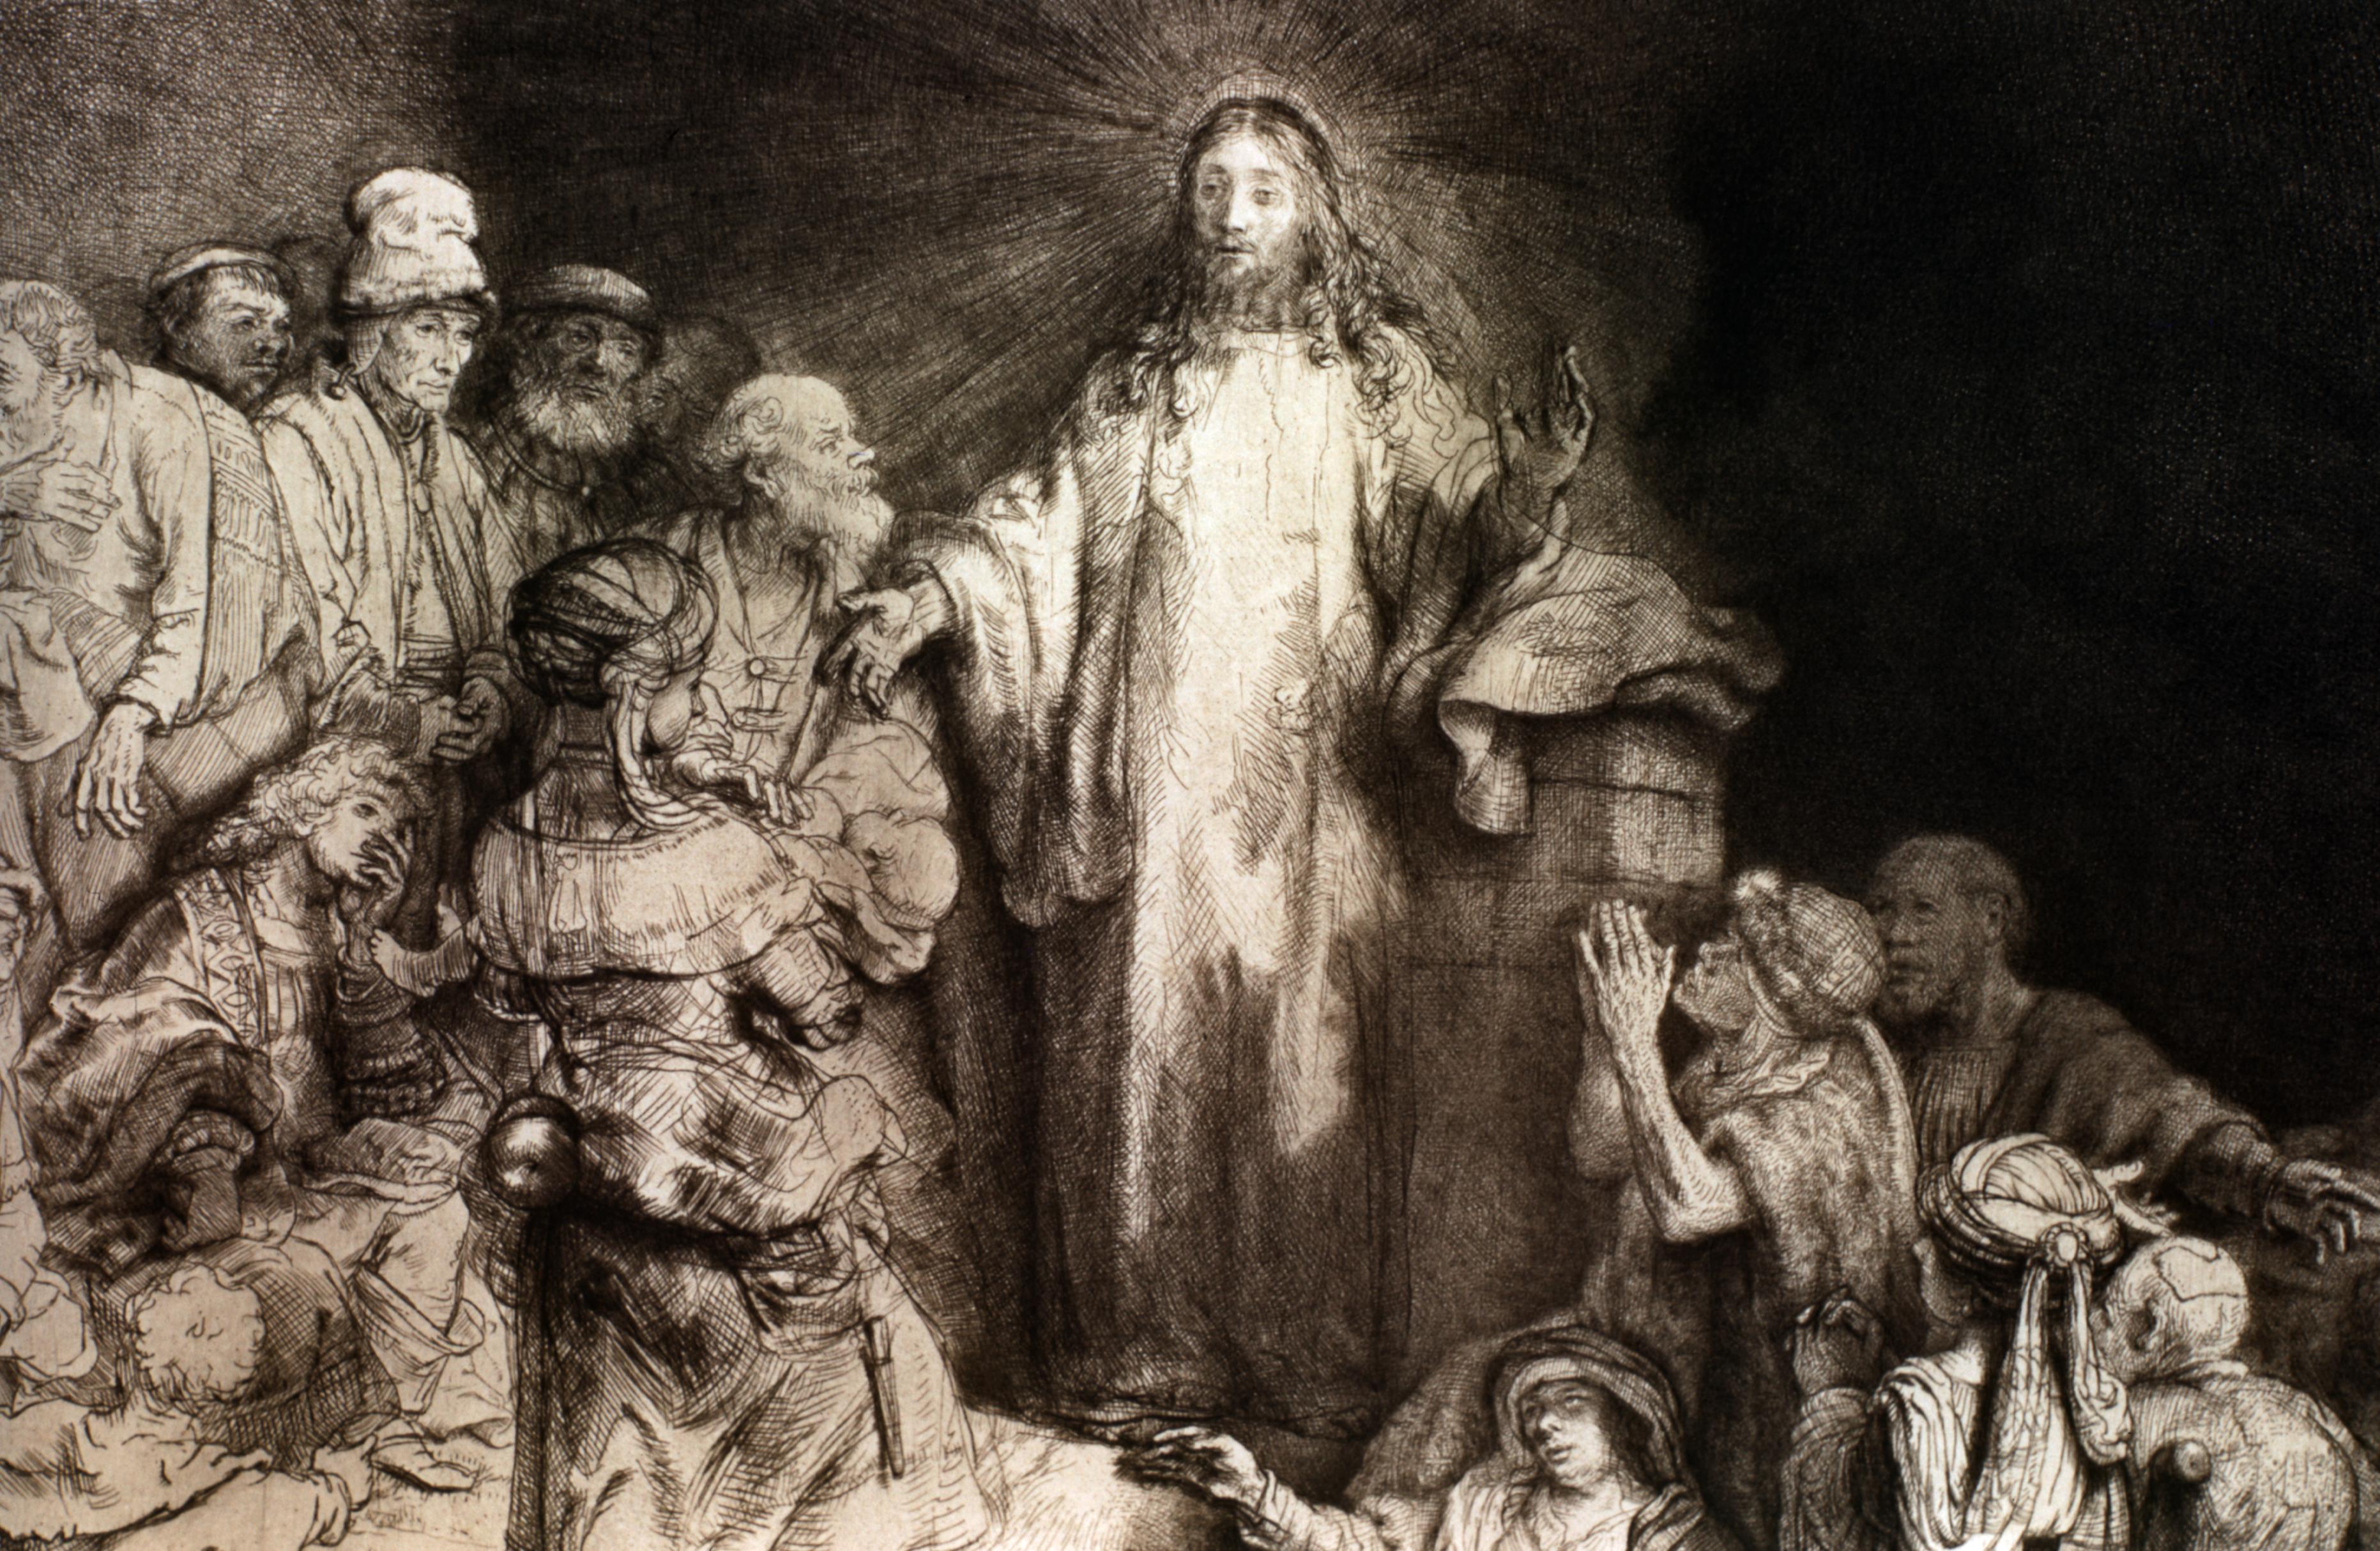 Jesus Christ heals the sick in this painting by Rembrandt Harmensz van Rijn.